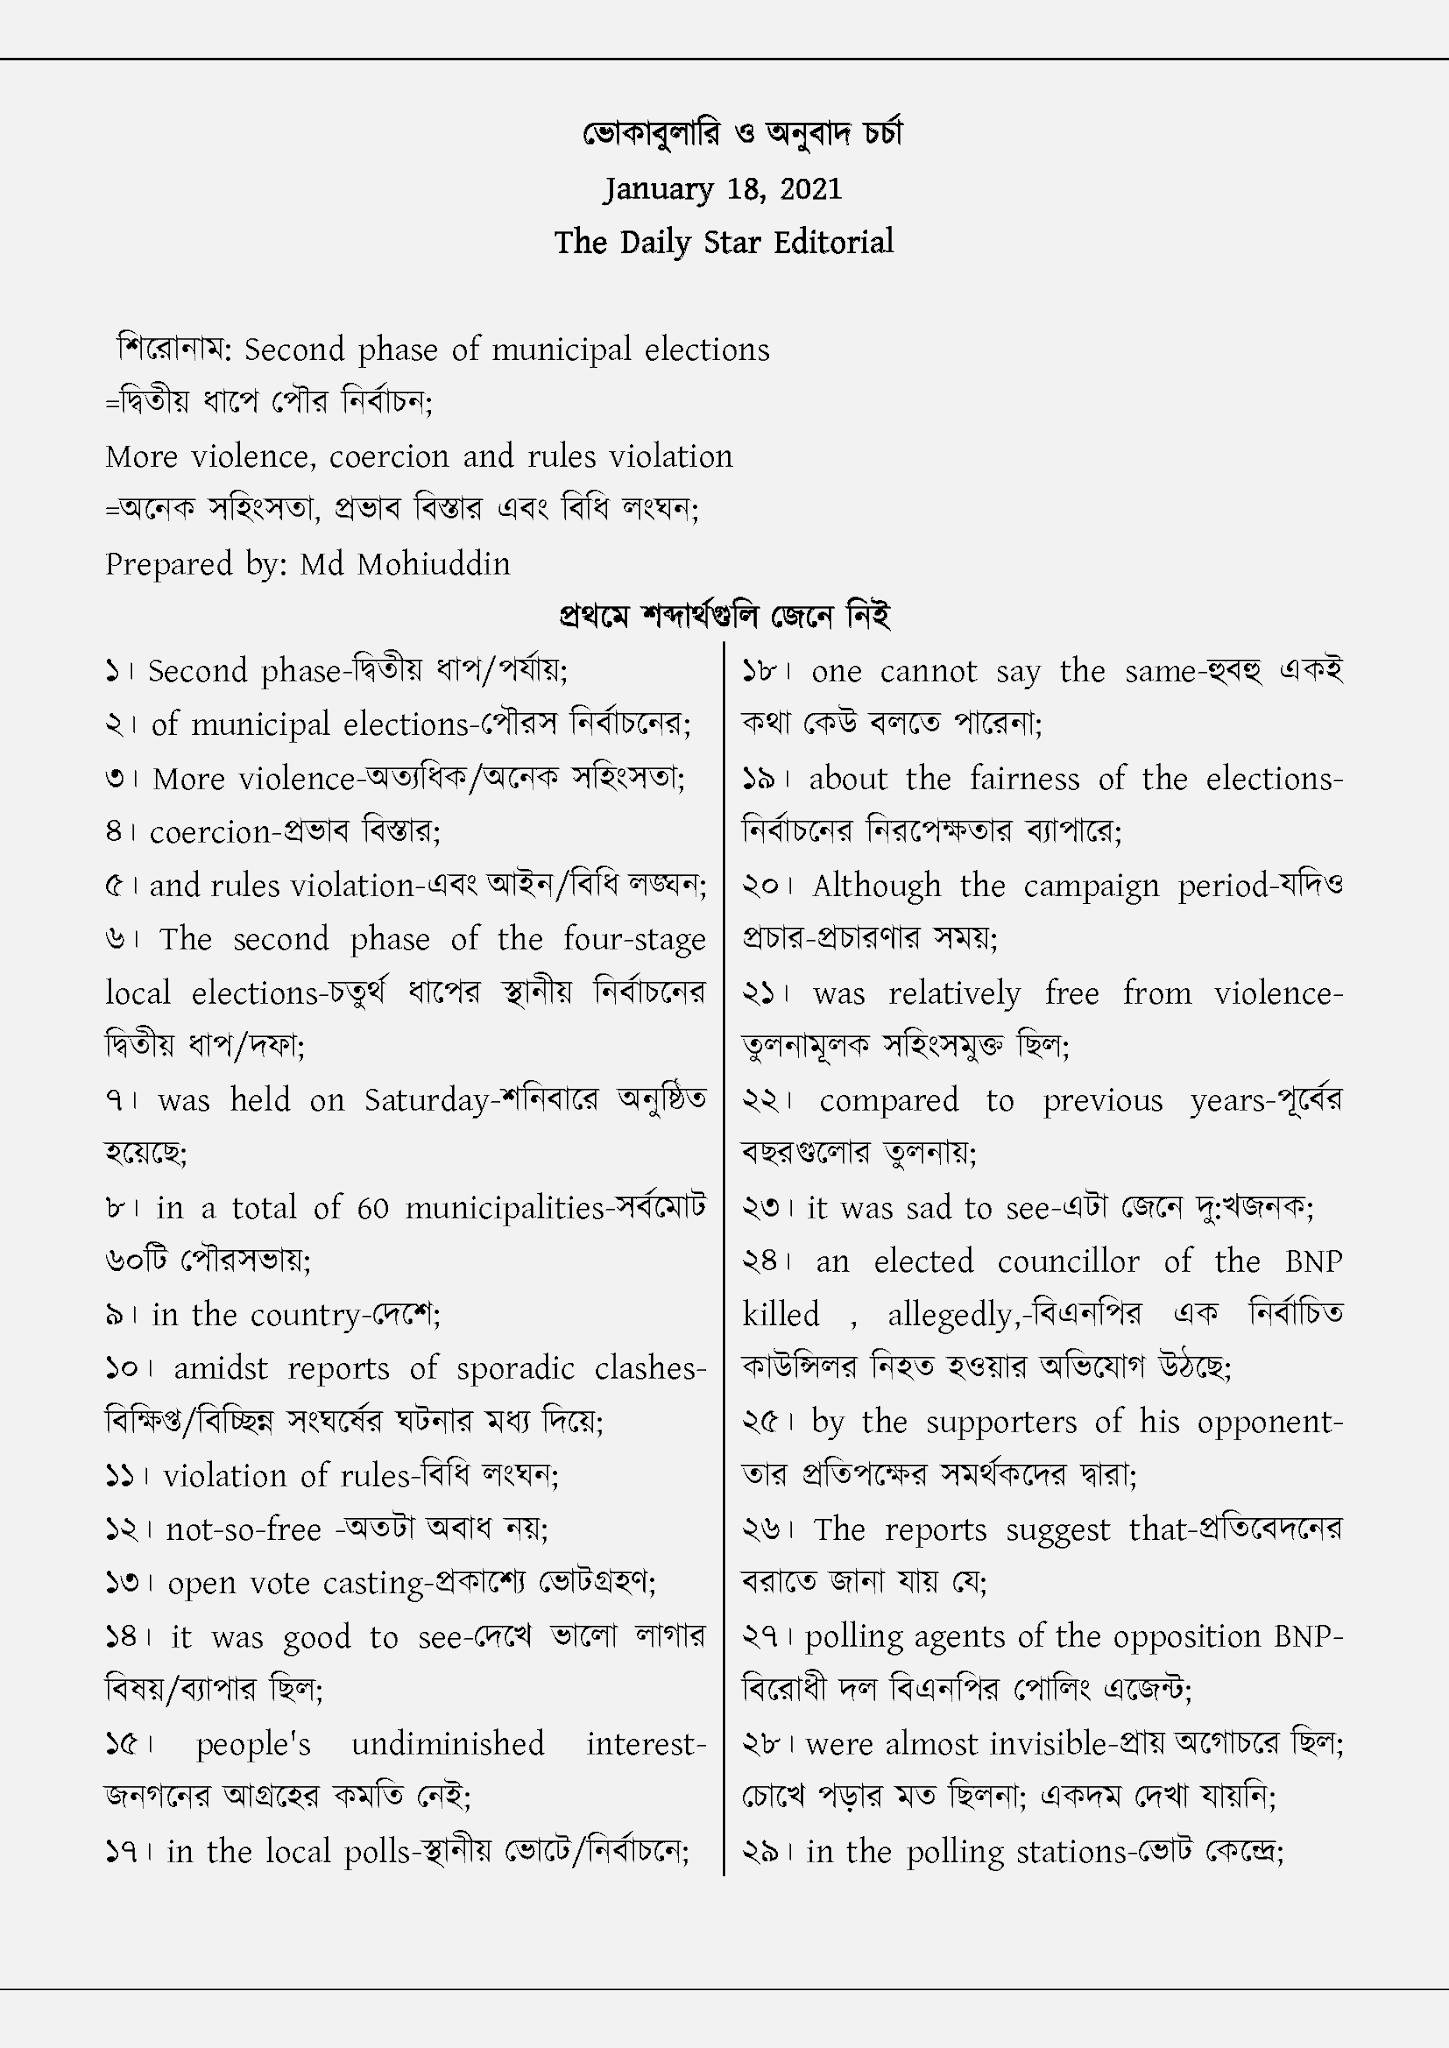 Daily Star থকে চলমান গুরুত্বপূর্ণ বিষয়ের উপর ইংরেজি টু বাংলা অনুবাদ